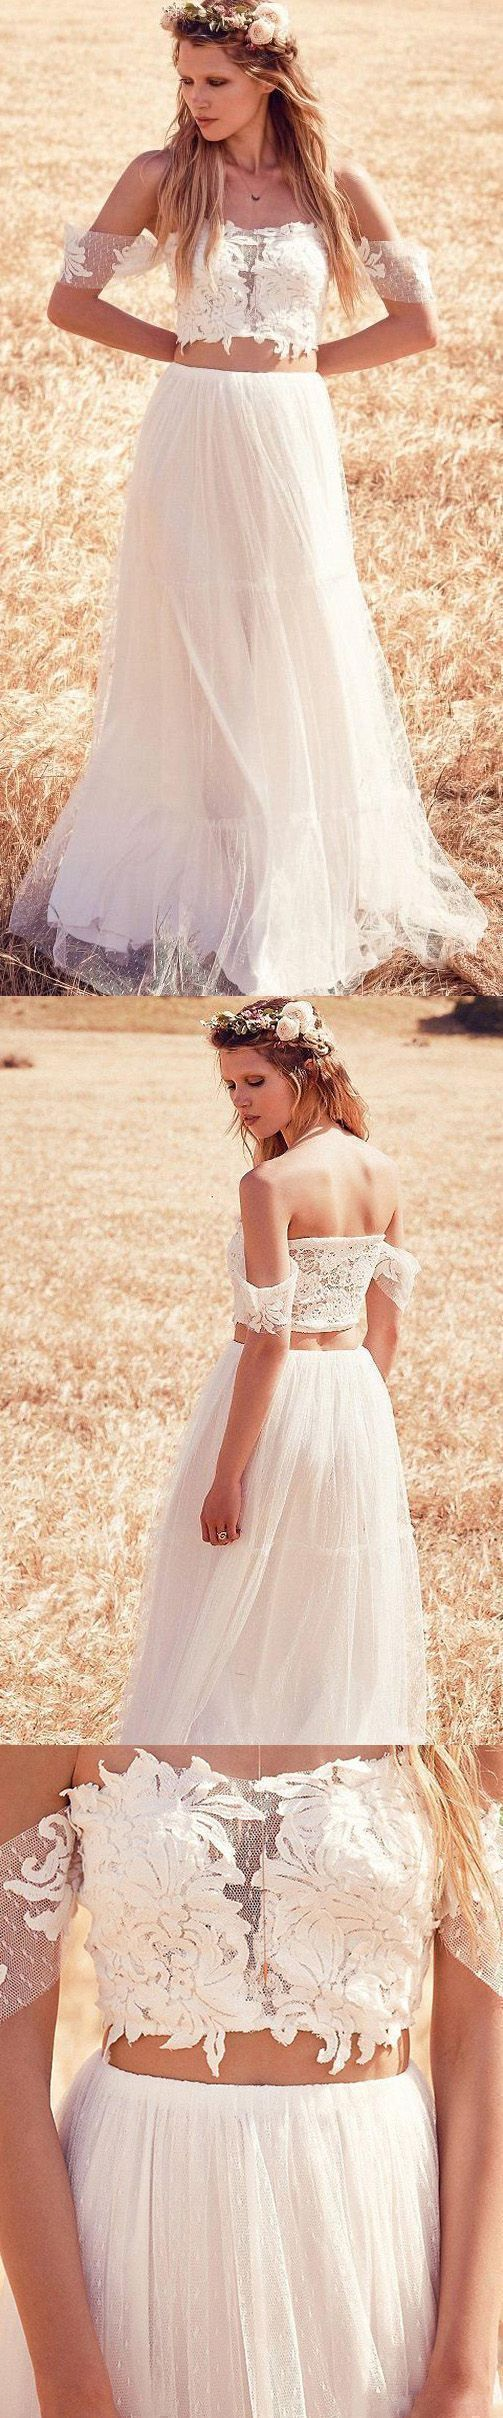 Wedding dresses with lace long wedding dresses short sleeve